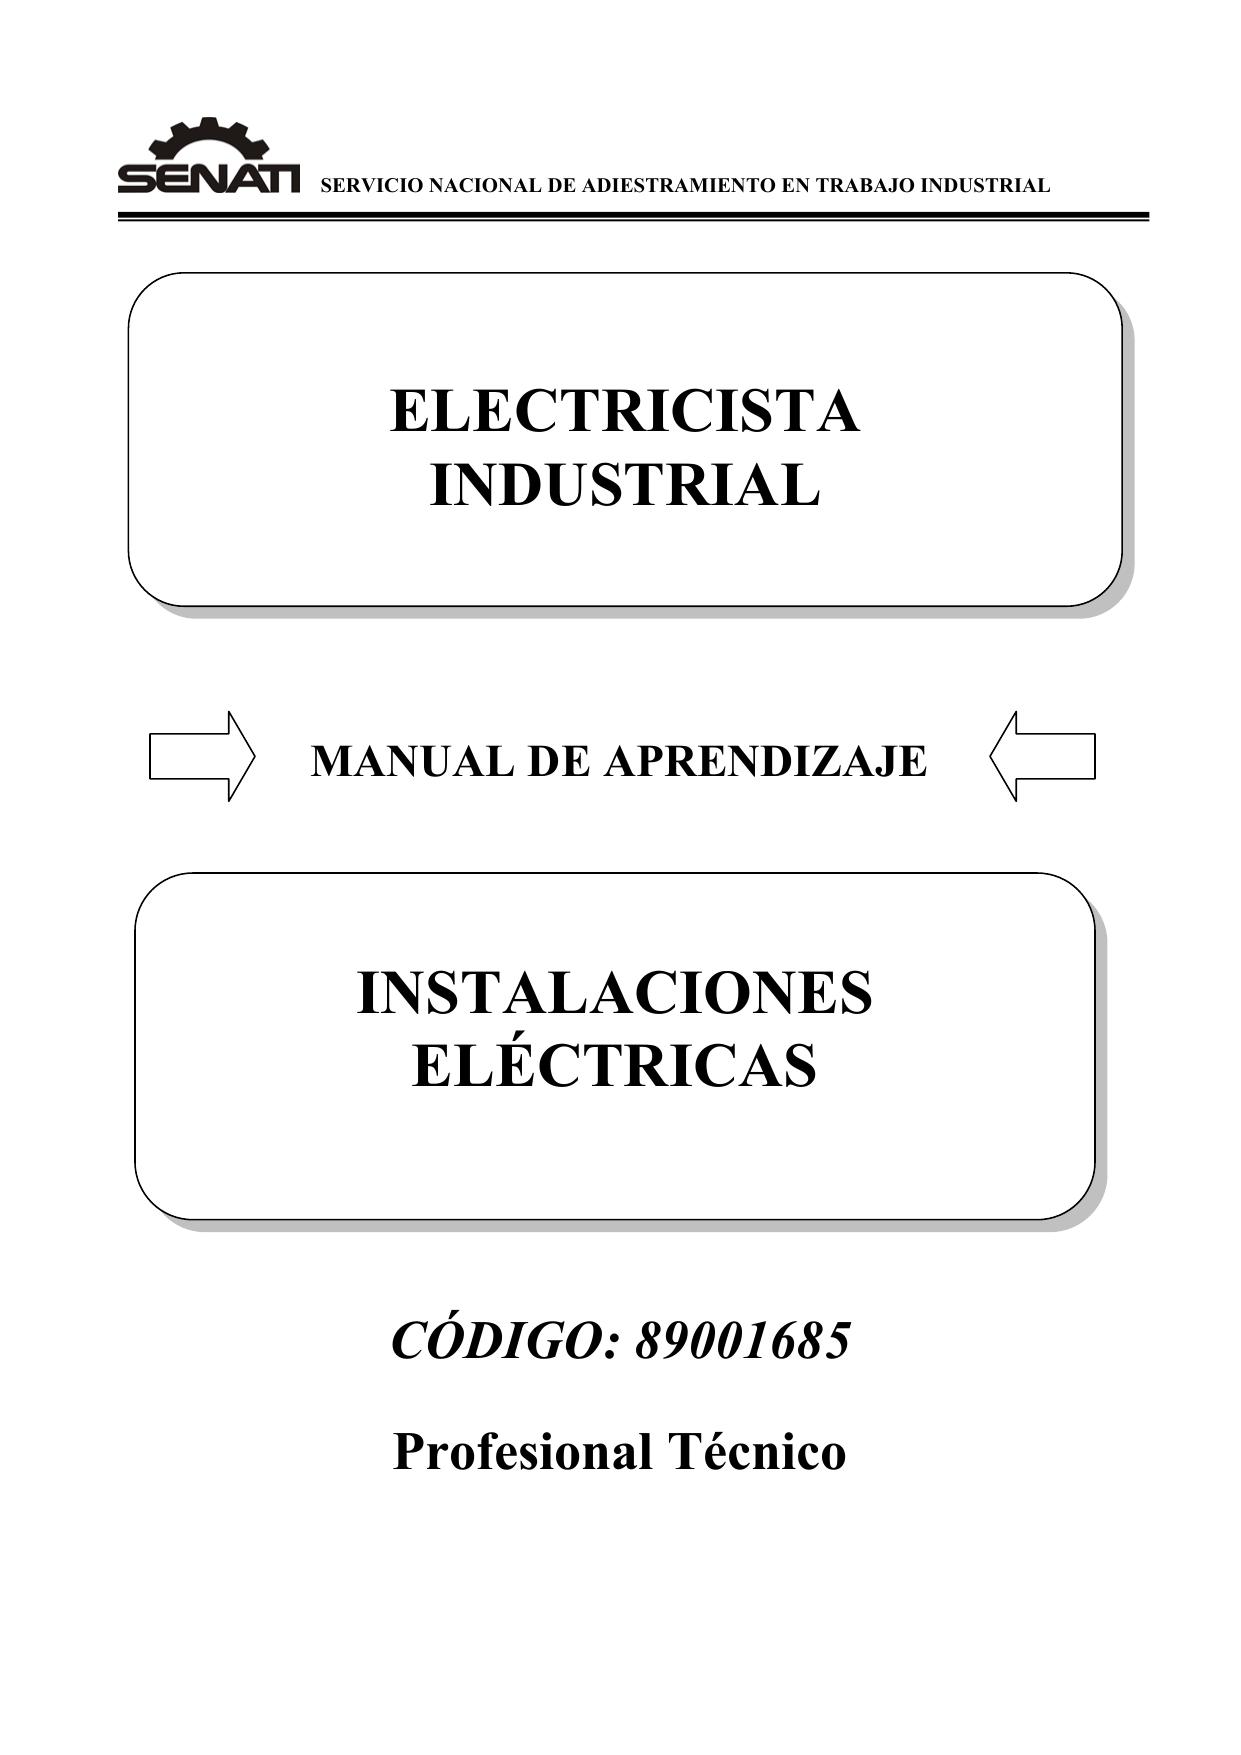 3 Pc Blanco Empotrado Contactos Magn/ético Interruptor De L/áminas para Puerta Ventana